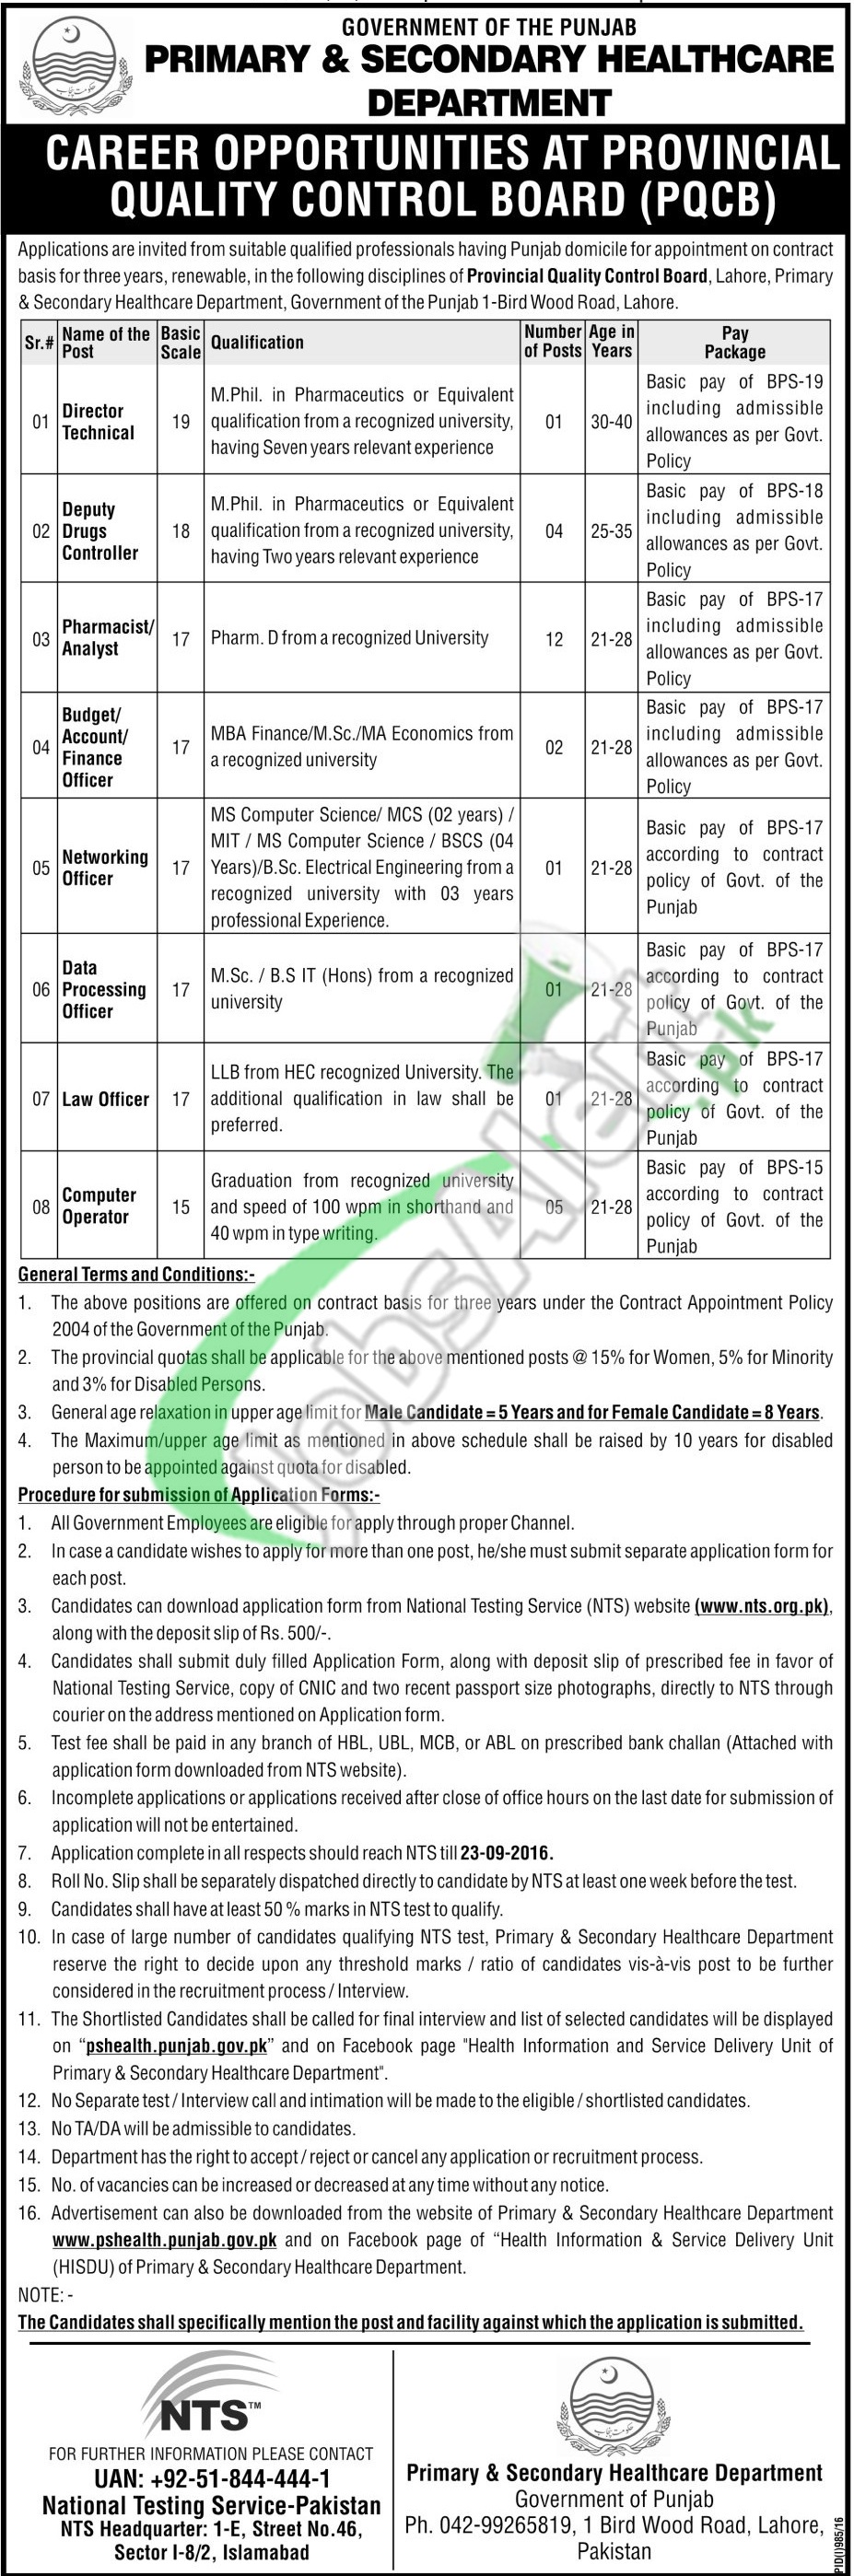 Provincial Quality Control Board Punjab Jobs